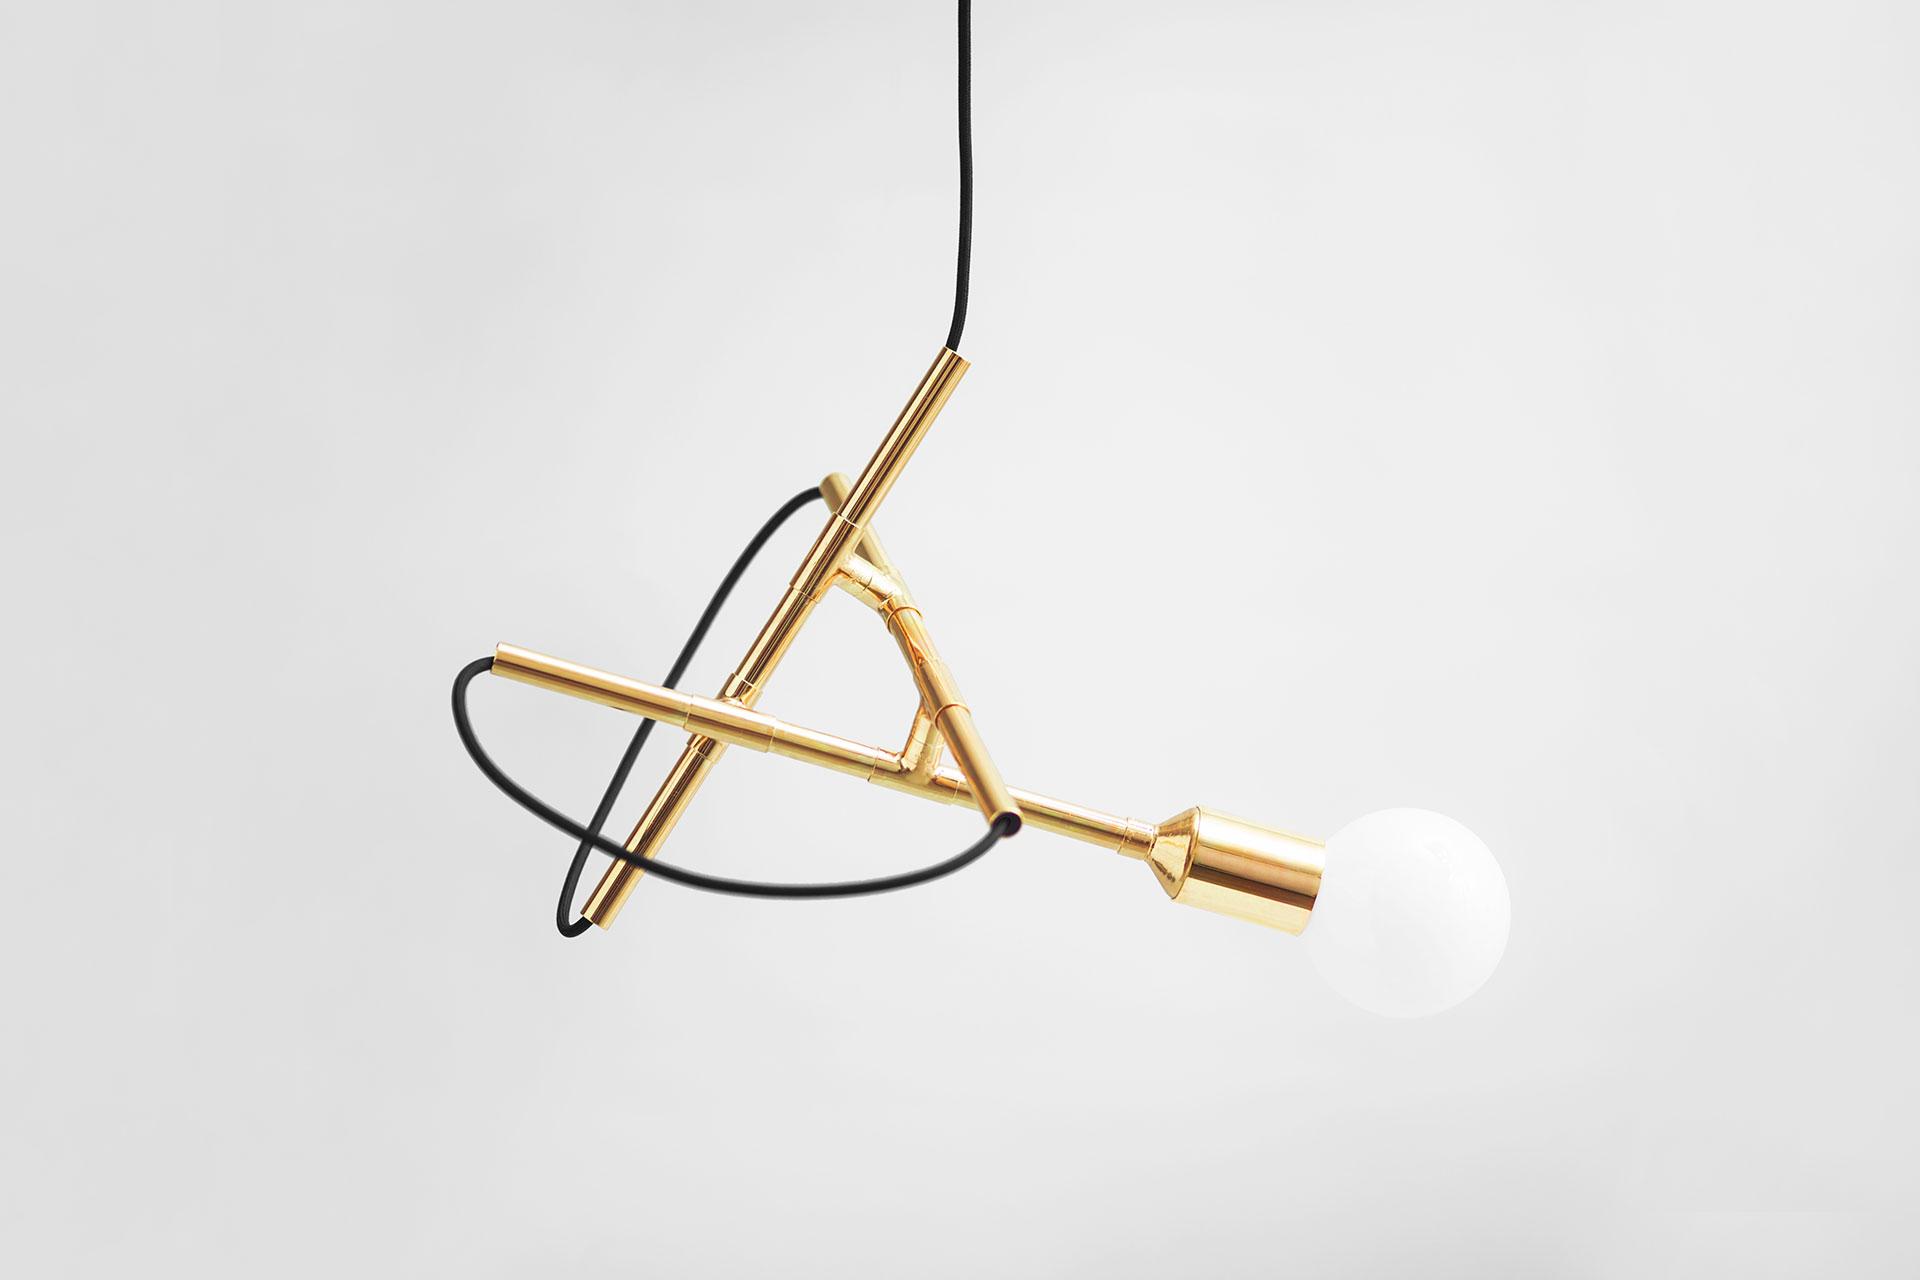 Zapalgo Zoido Ceiling Lamp in brass